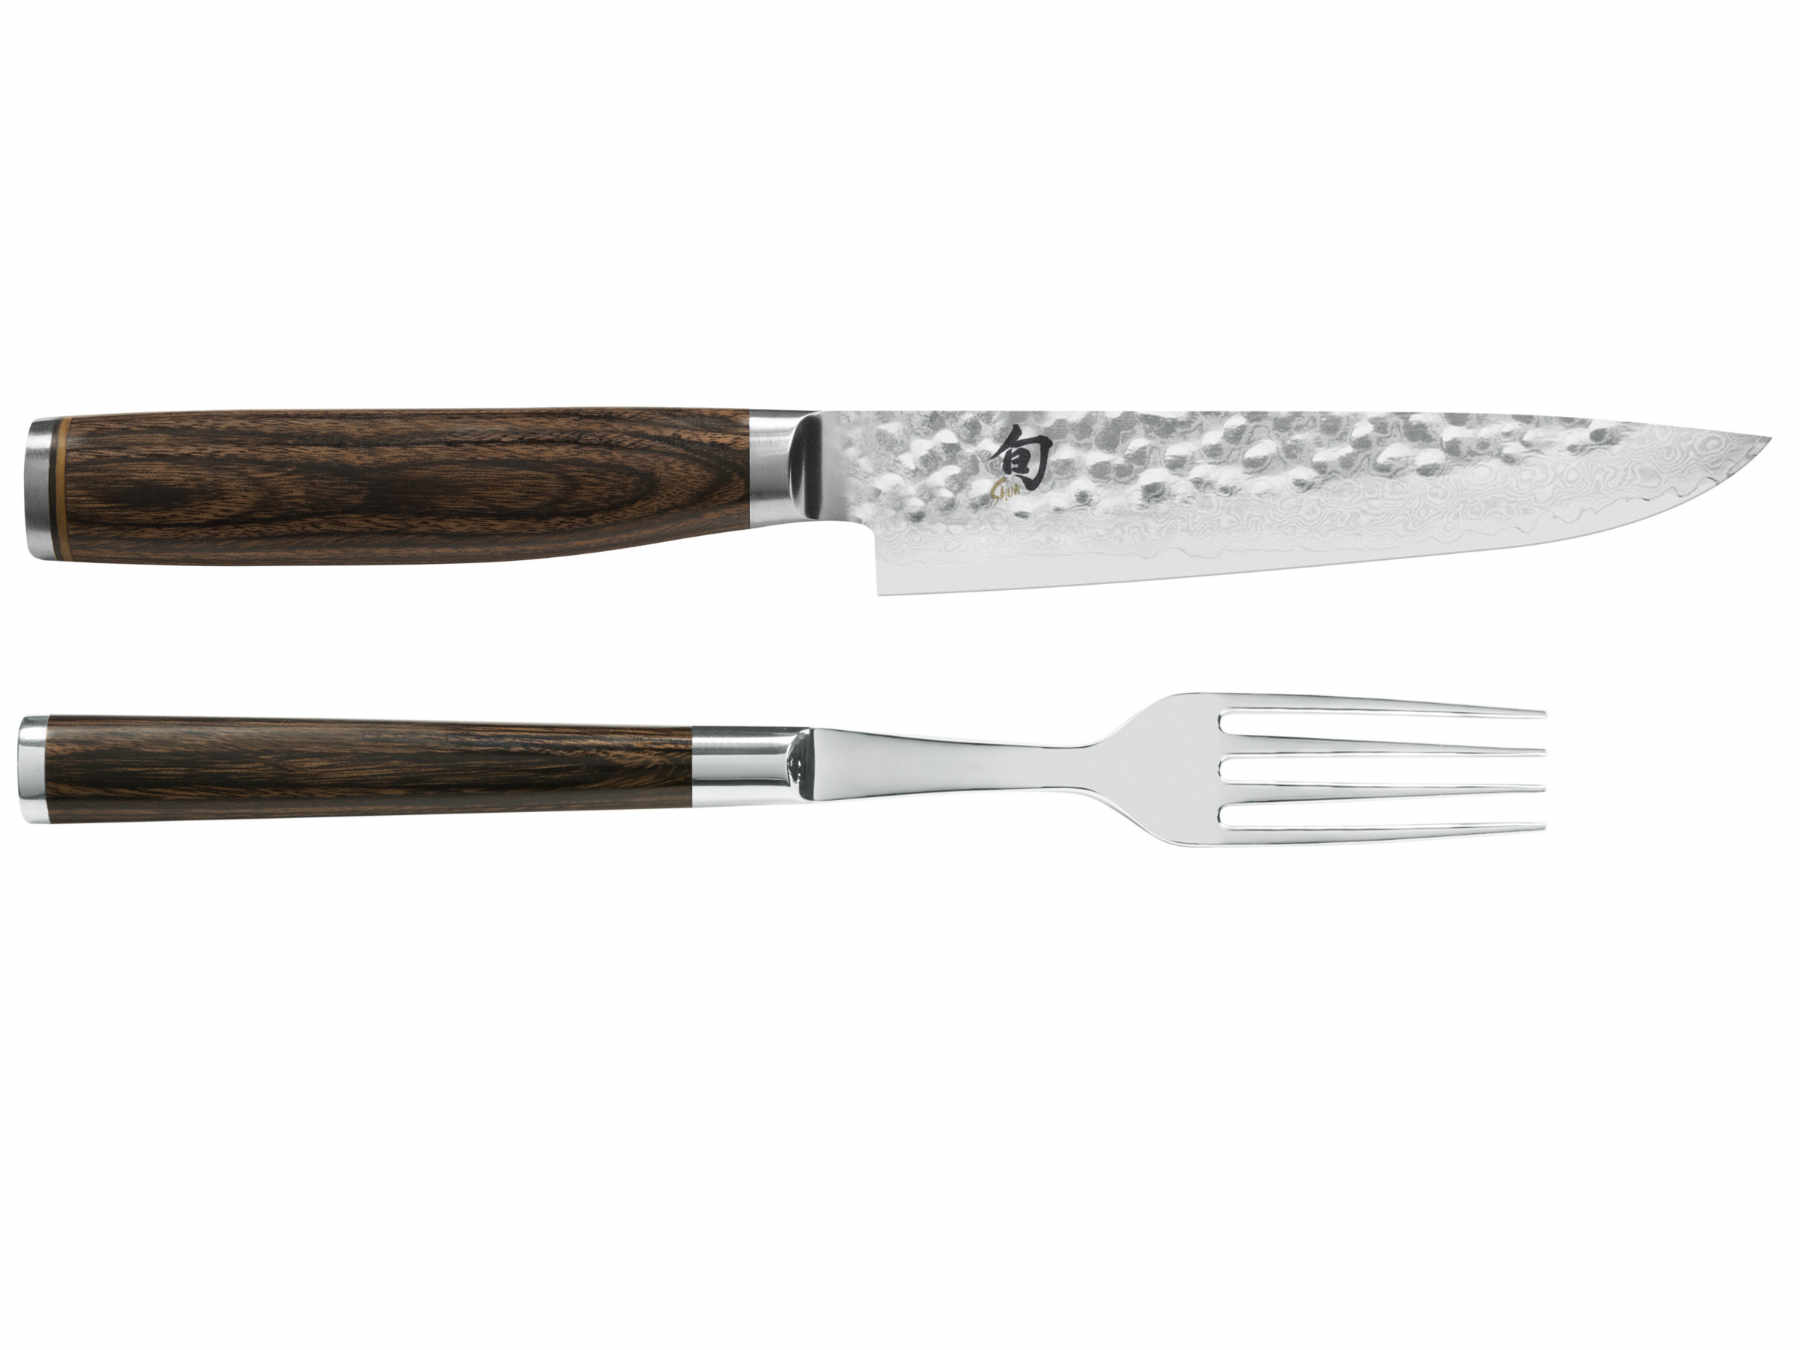 KAI Shun Premier TDM-0907 Besteckset: Steakmesser + Gabel